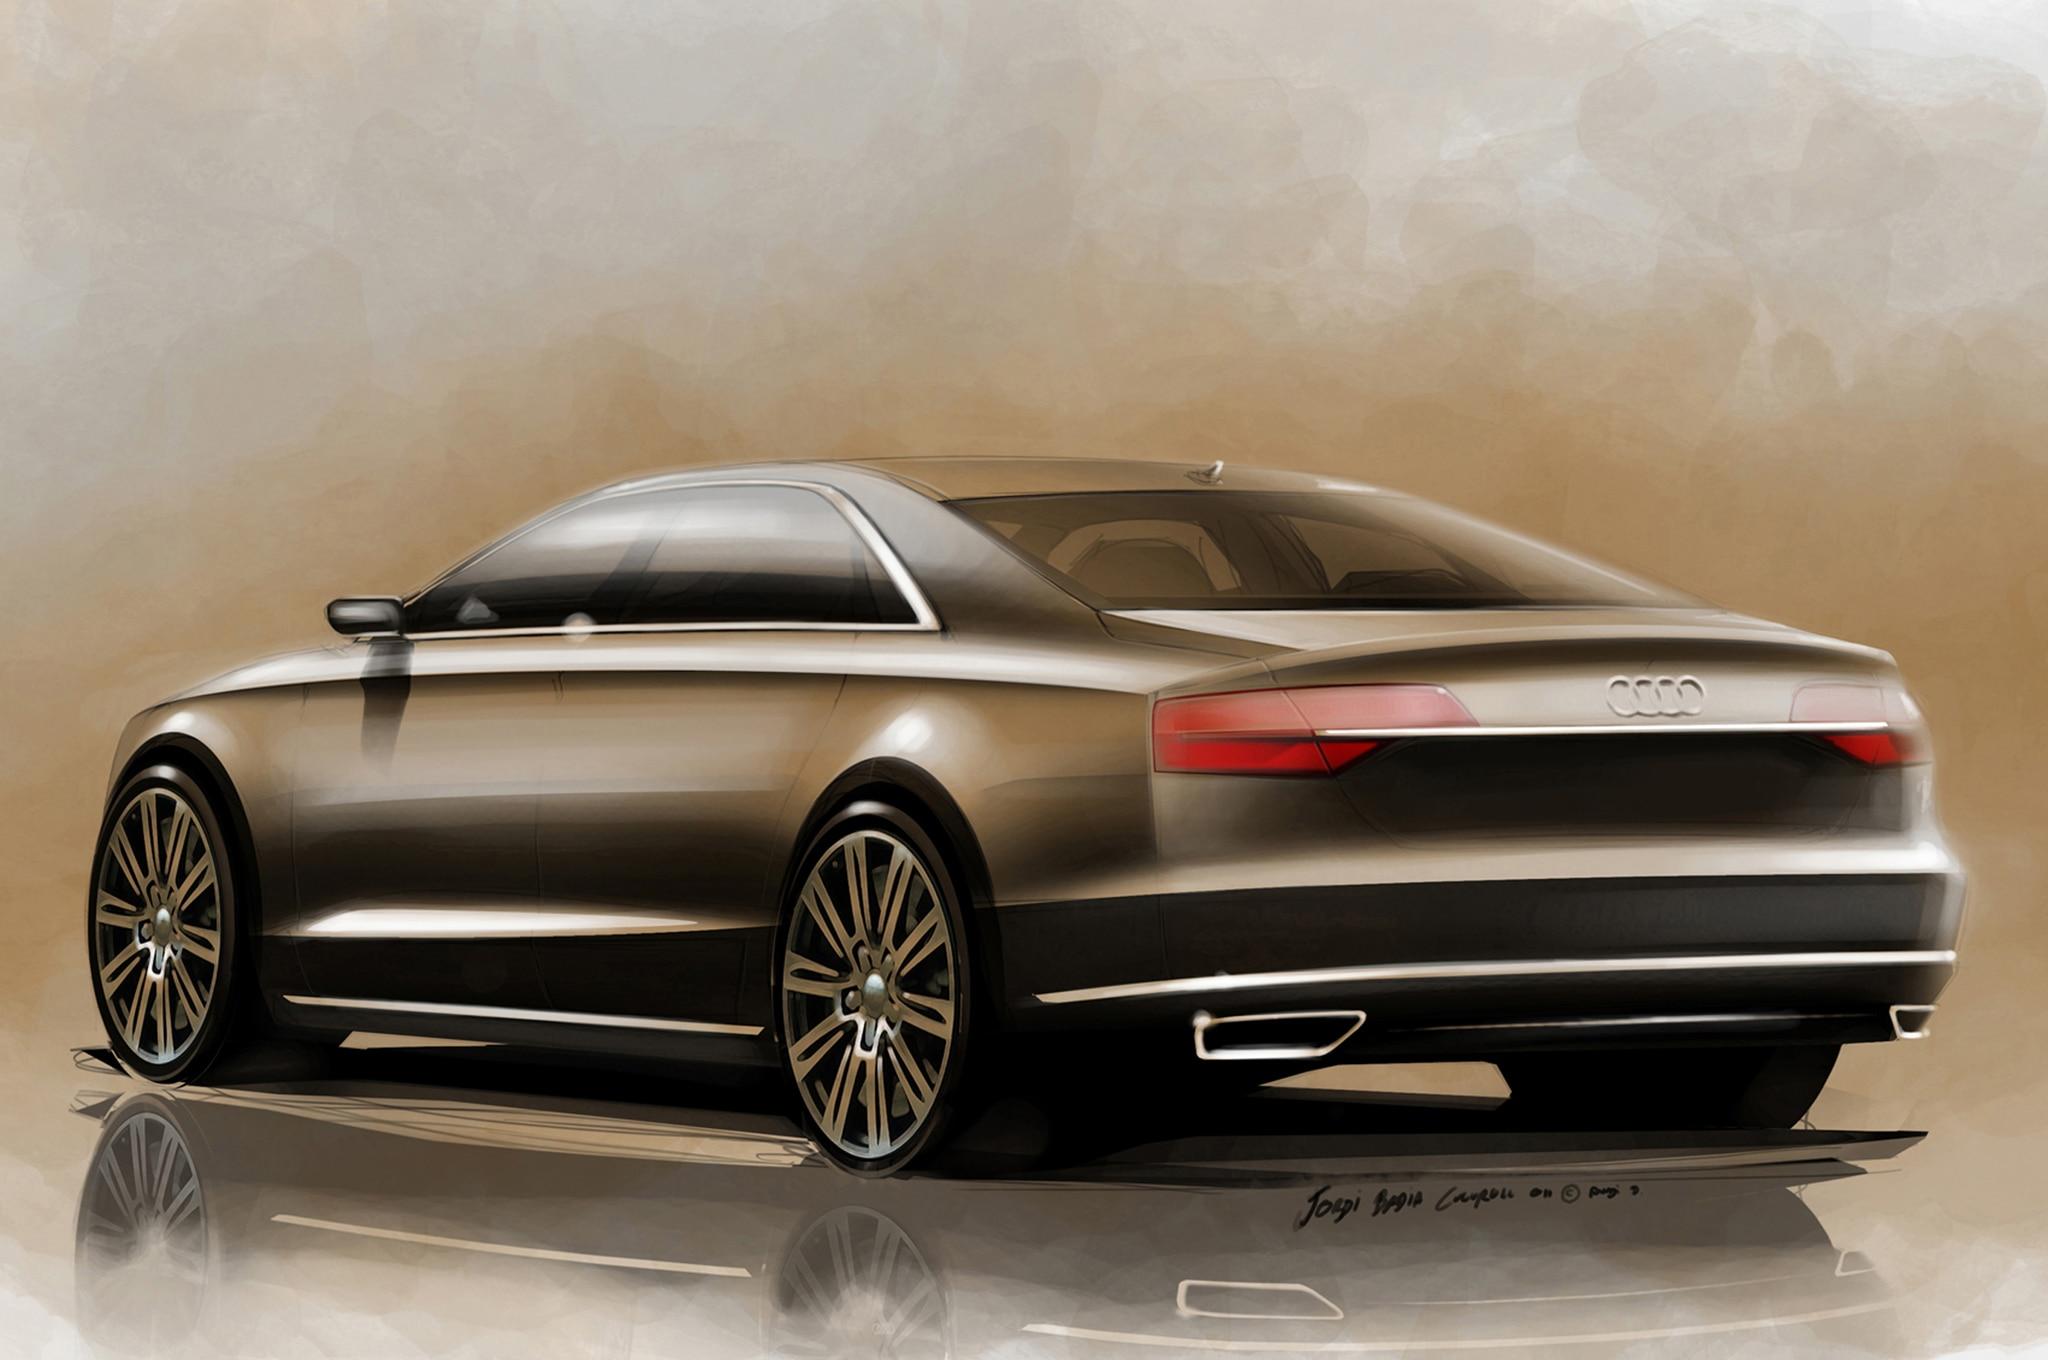 2015 Audi A8 Left Rear Angle Sketch Color1